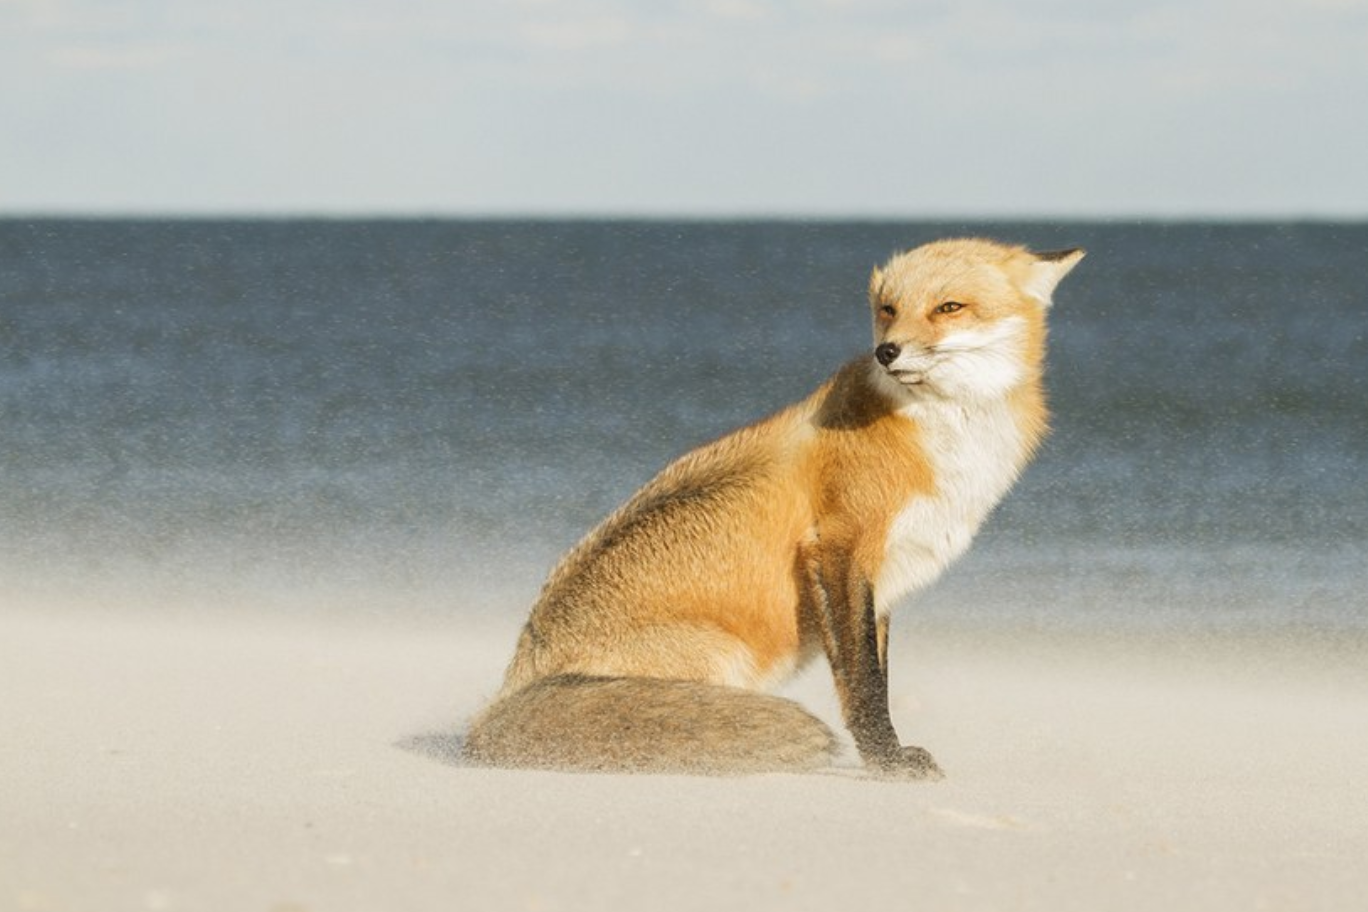 Fox in the wind